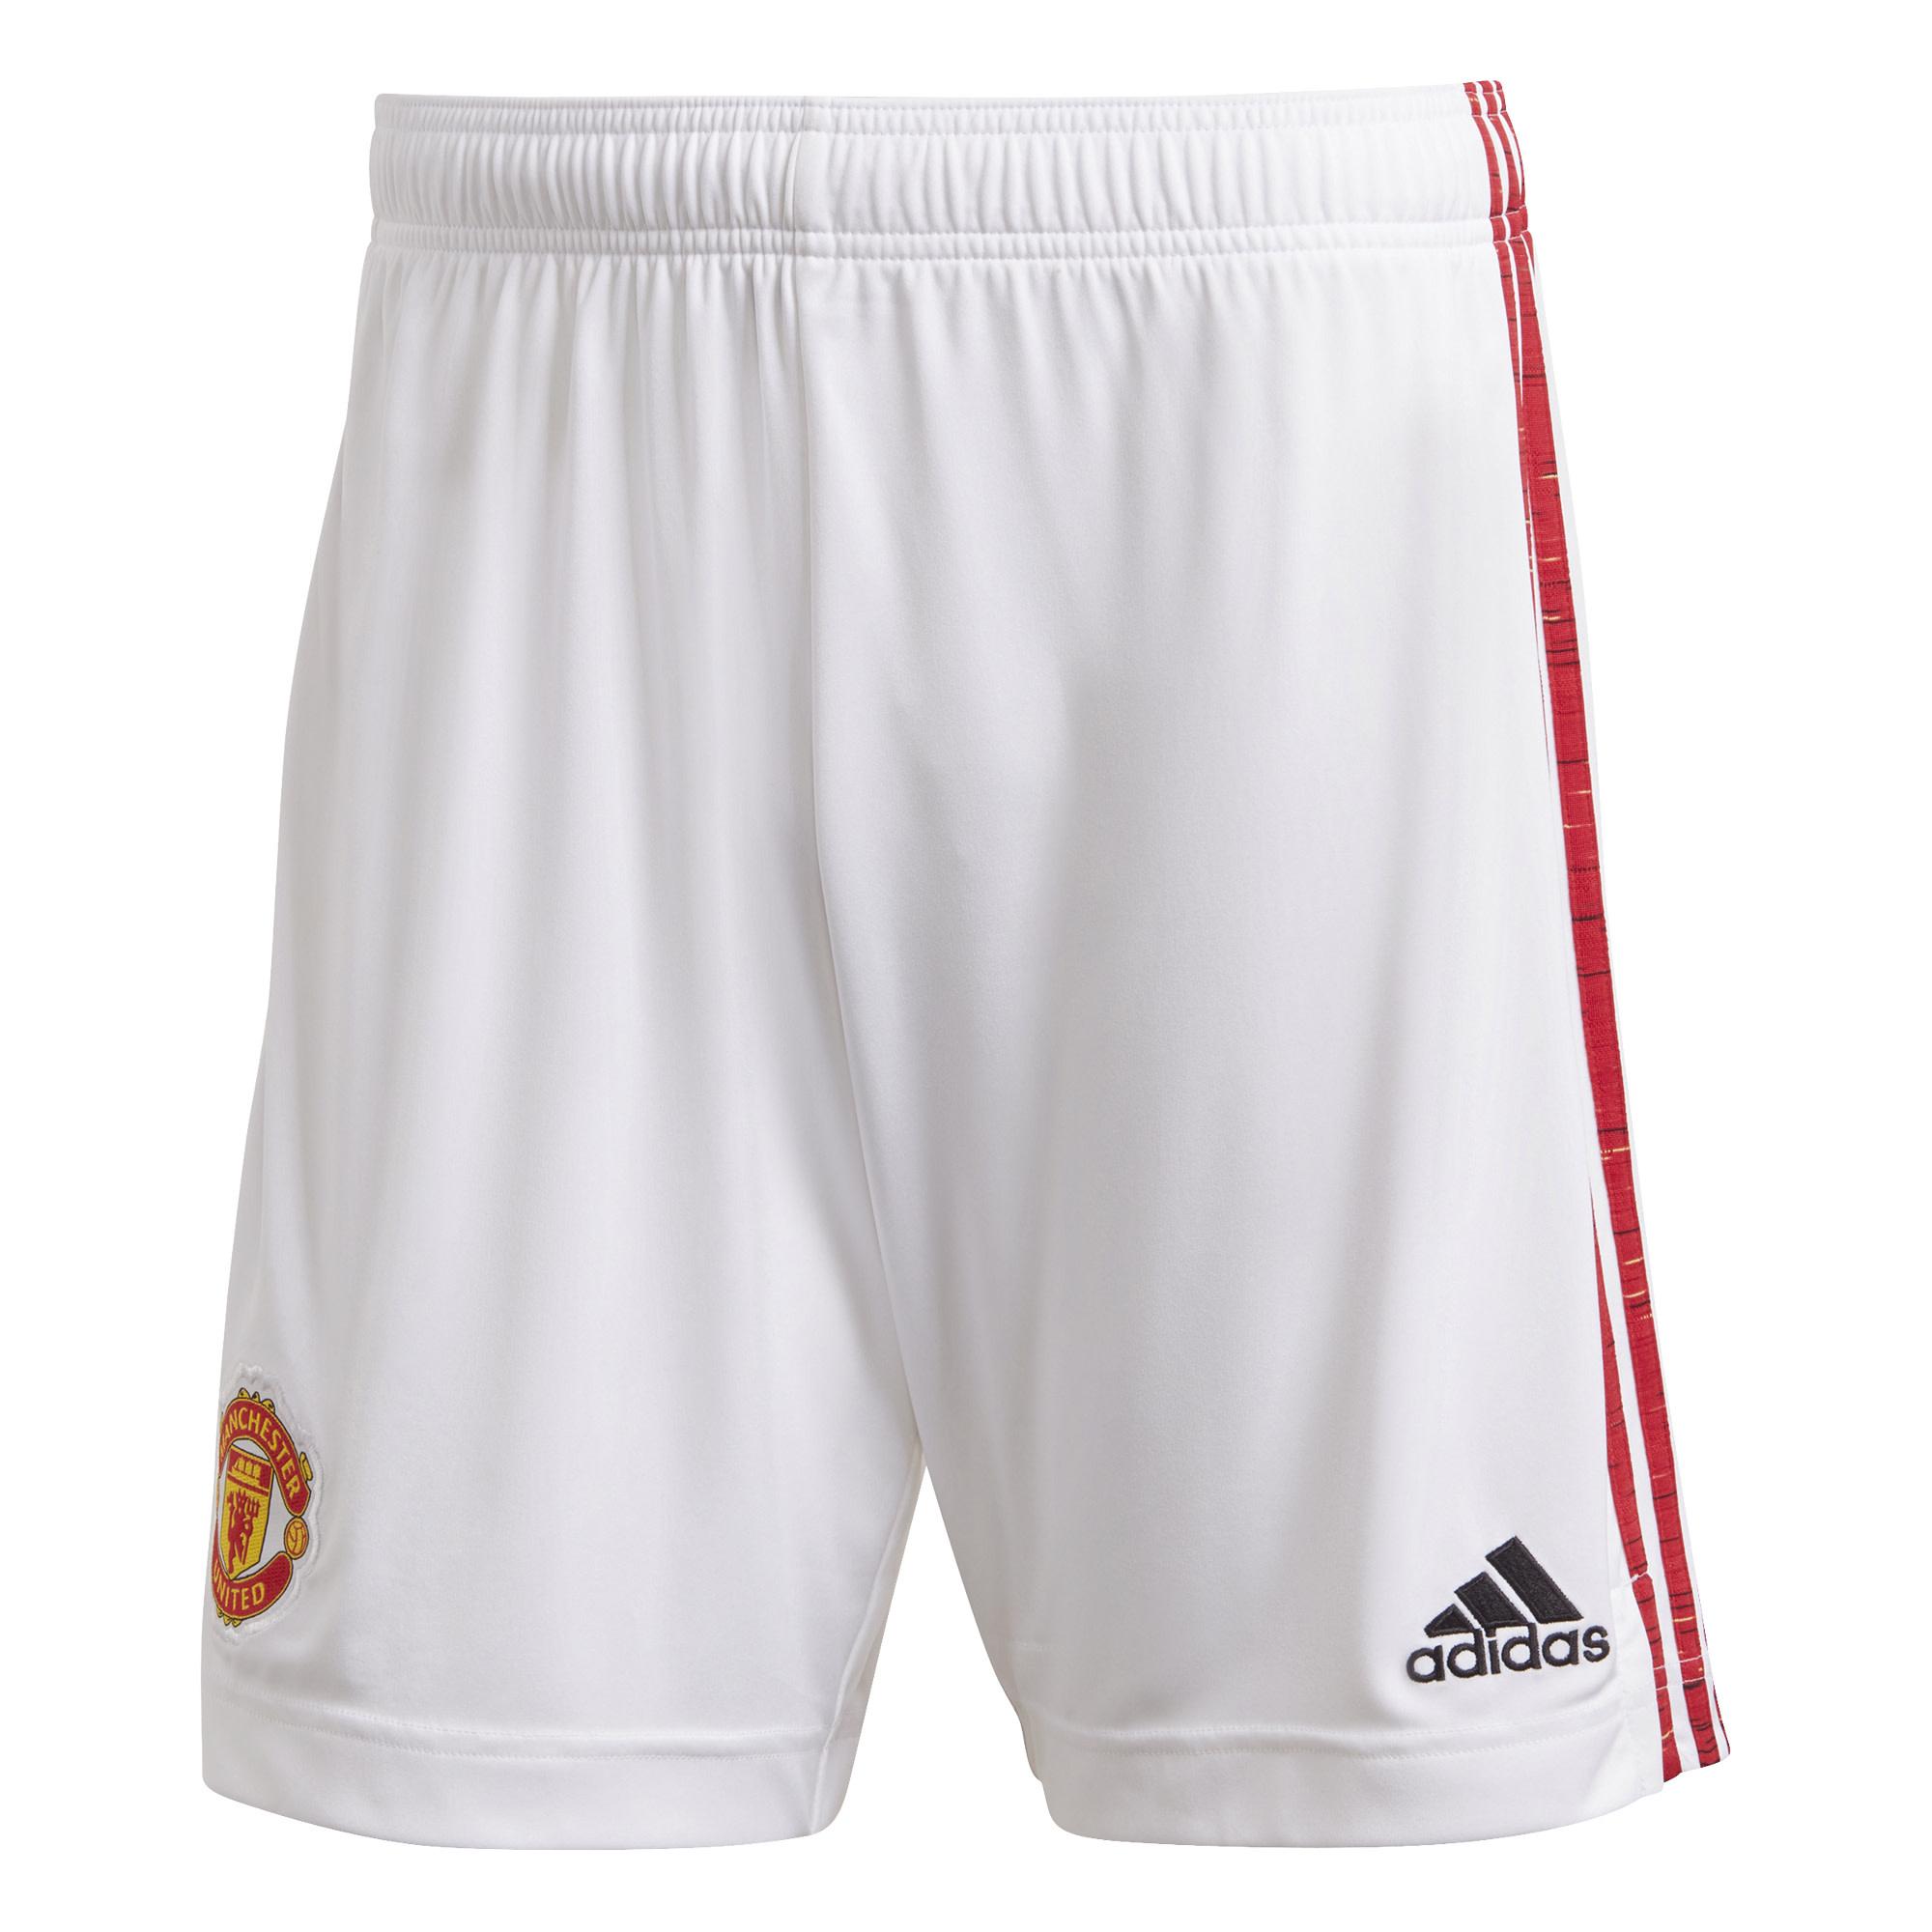 Adidas ADIDAS JR Manchester United Home Short '20-'21